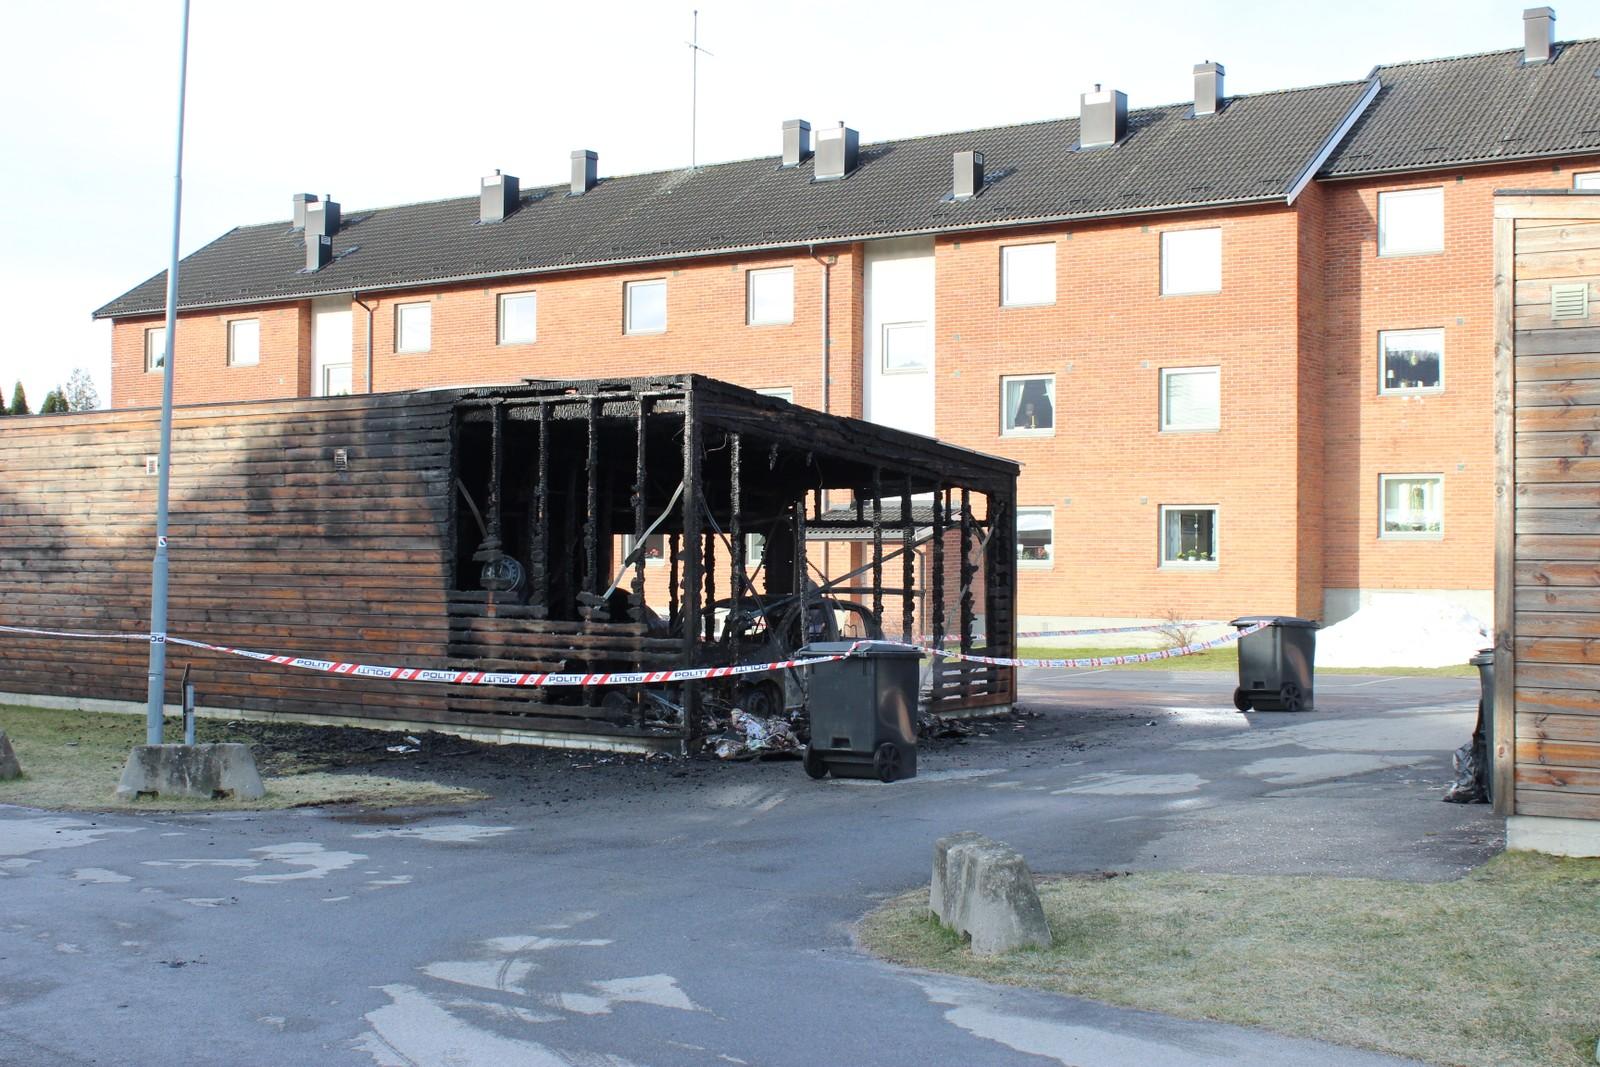 Garasjebygget i Poppelveien har fått store skader.